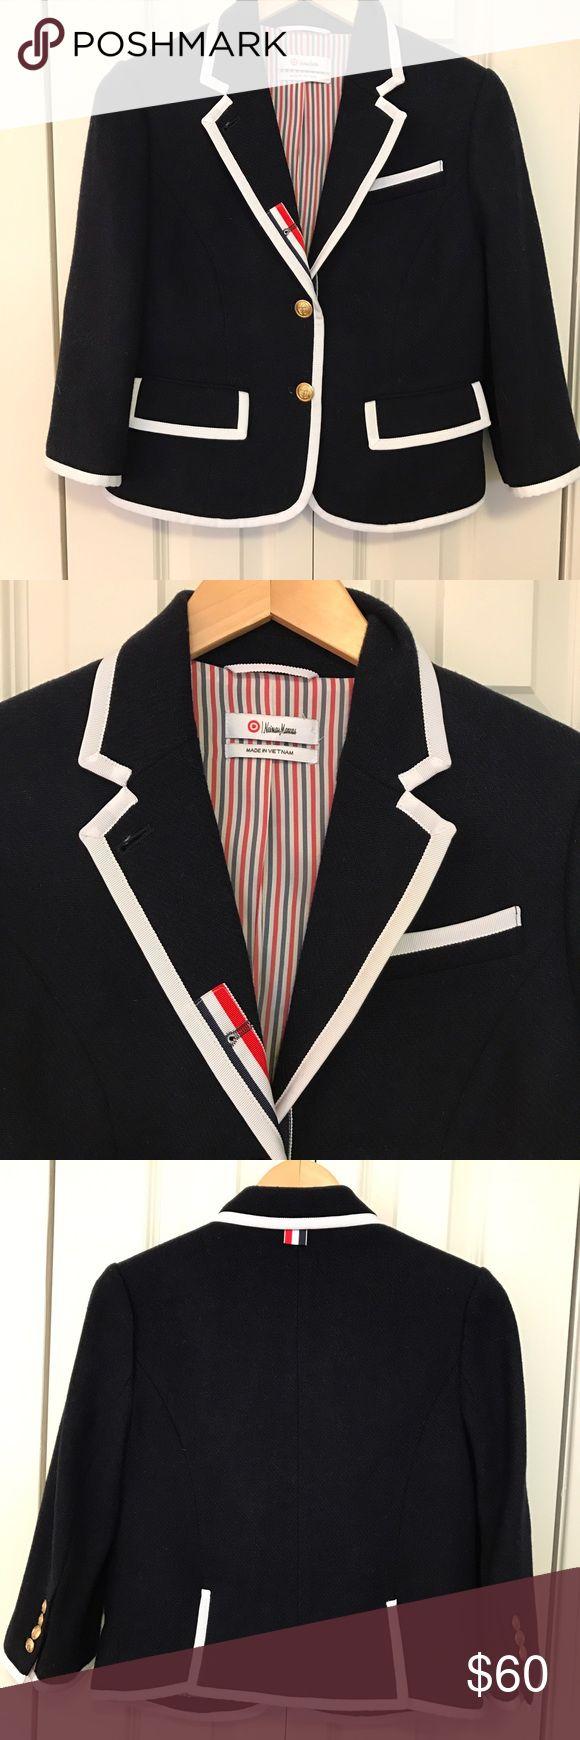 Spotted while shopping on Poshmark: Thom Brown Nieman Marcus for Target Blazer! #poshmark #fashion #shopping #style #Thom Browne #Jackets & Blazers